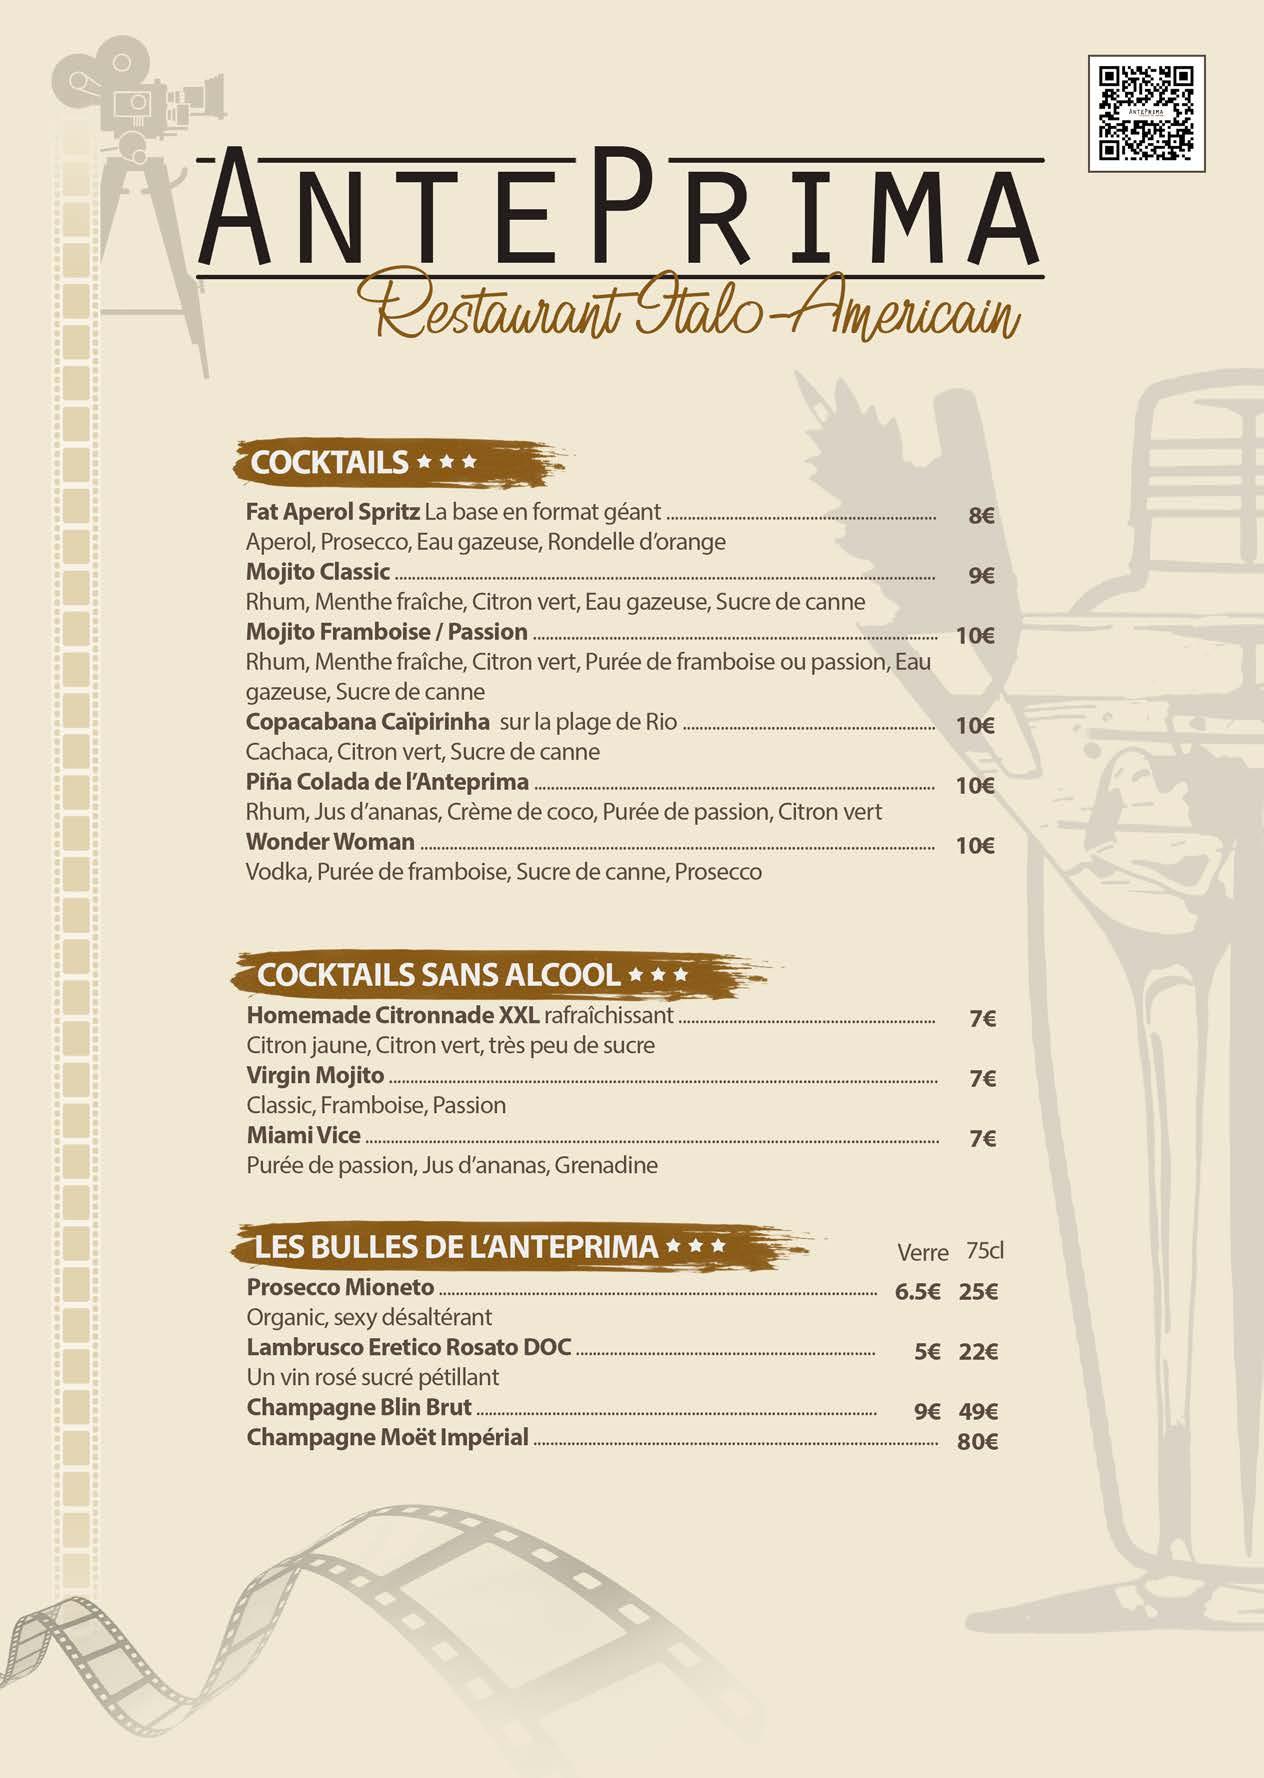 Carte des boissons Restaurant AntePrima (2)